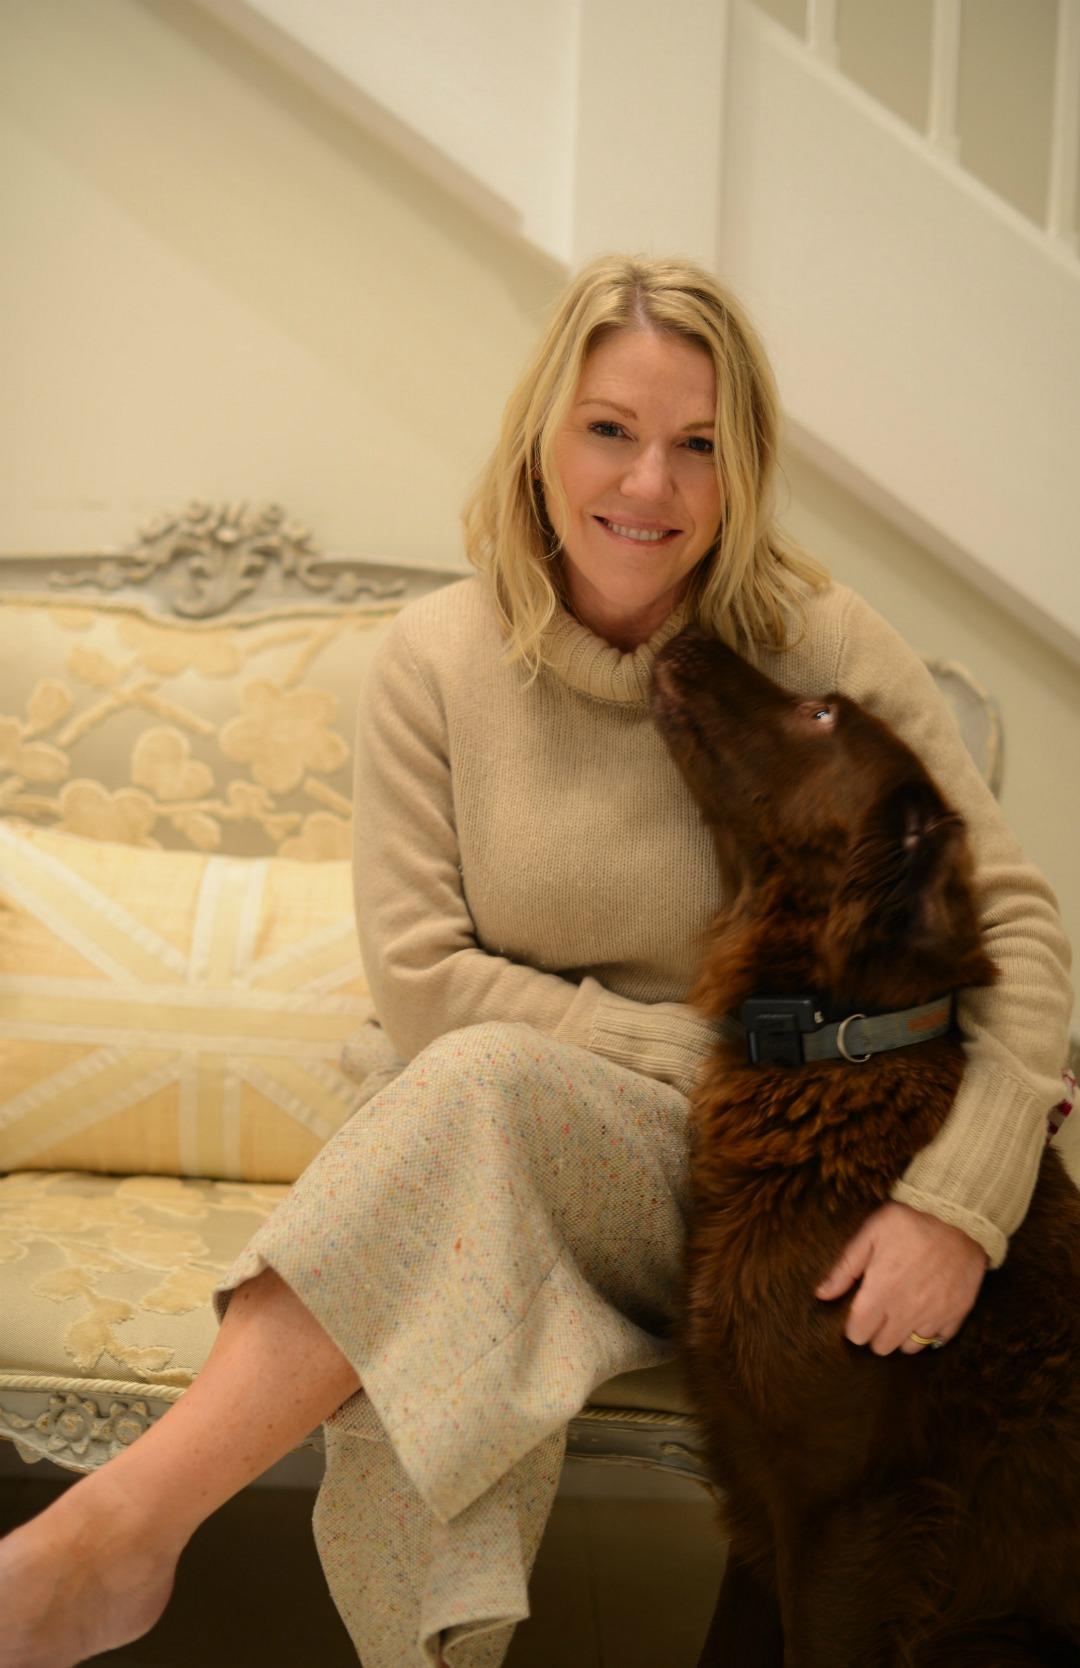 fashion stylist and blogger sara delaney